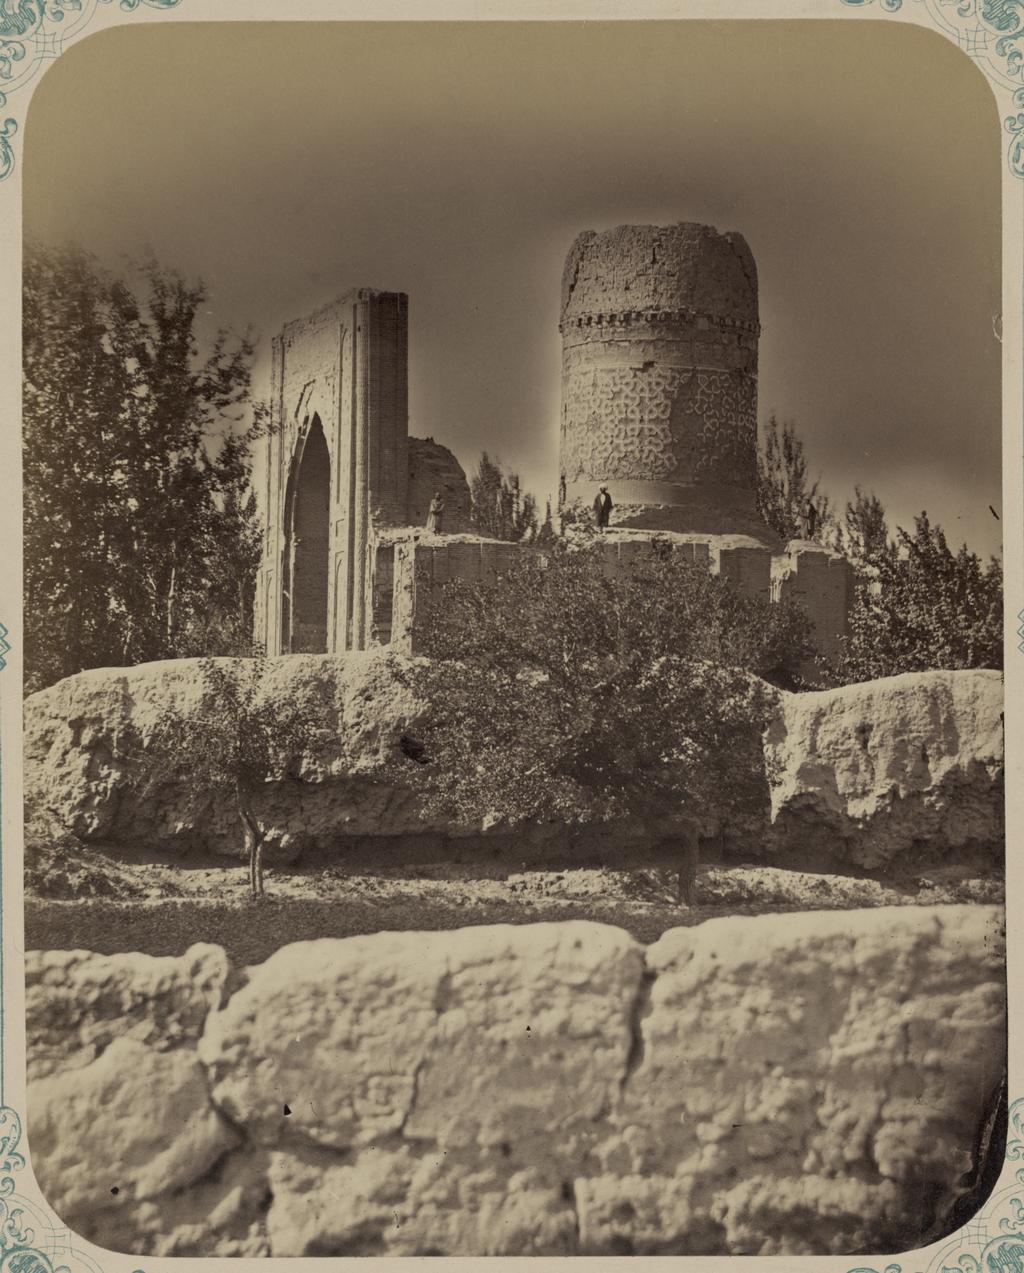 Ишрат-хана, развалины летнего дворца Тамерлана. Боковой фасад (южный)